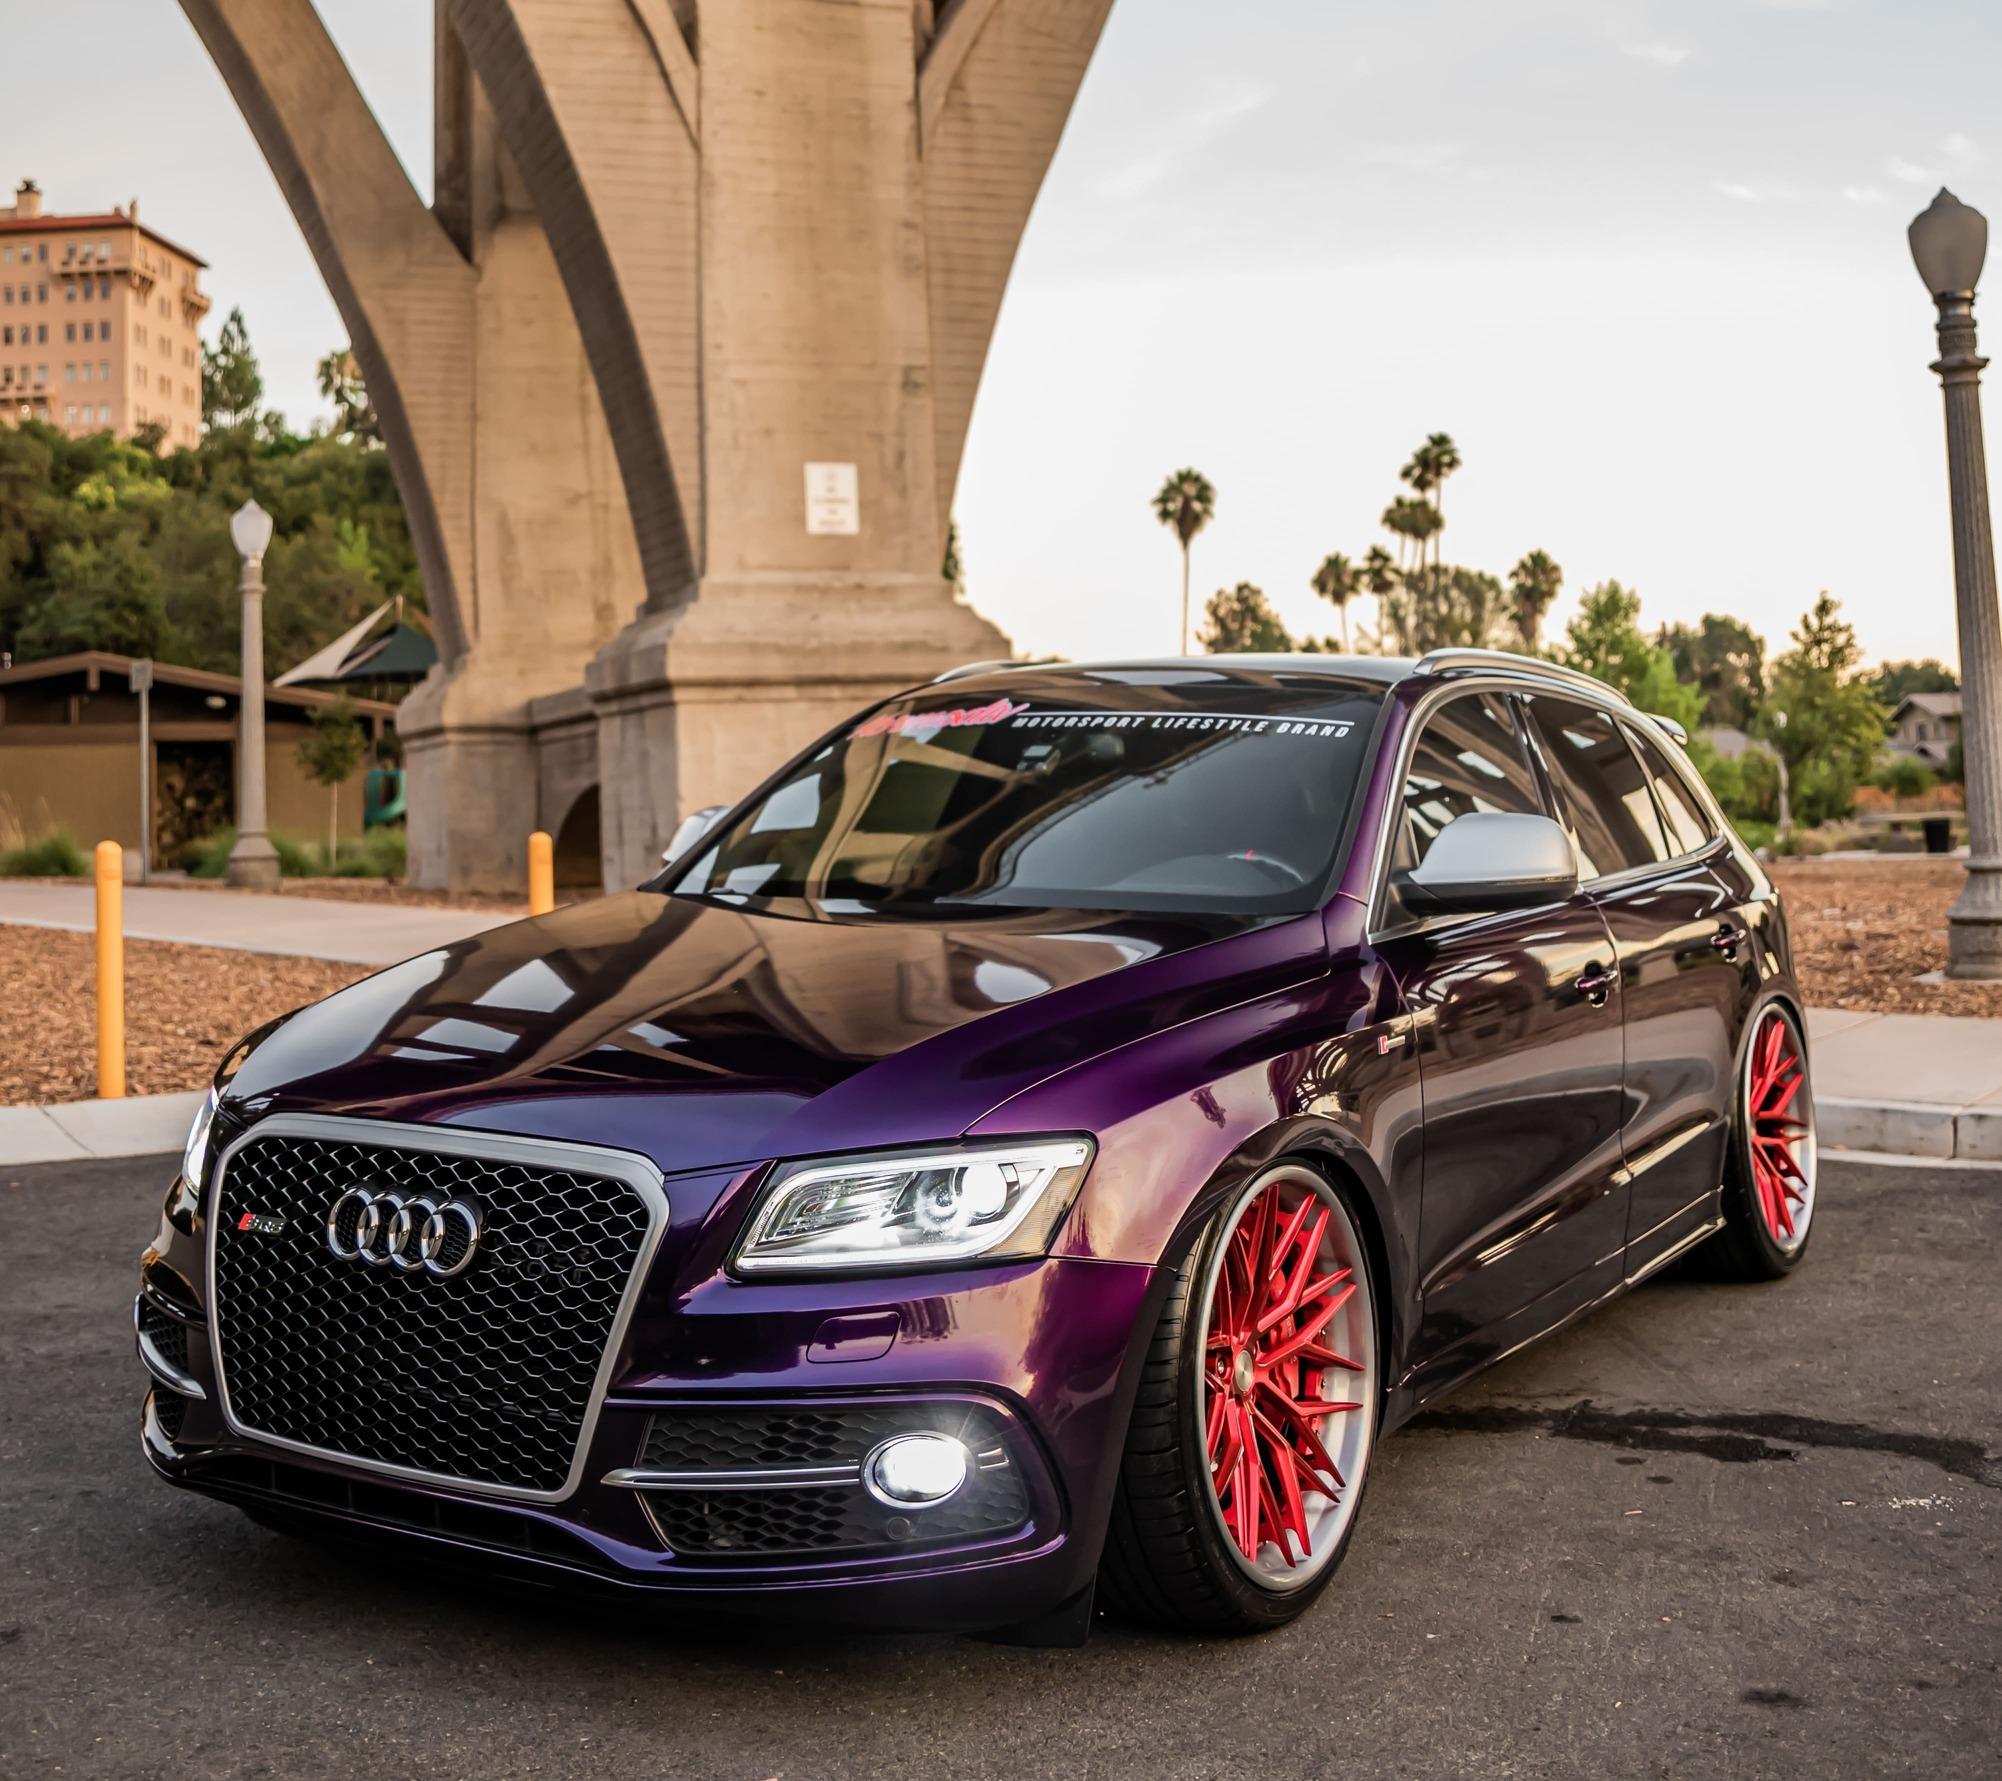 Modded Audi SQ5